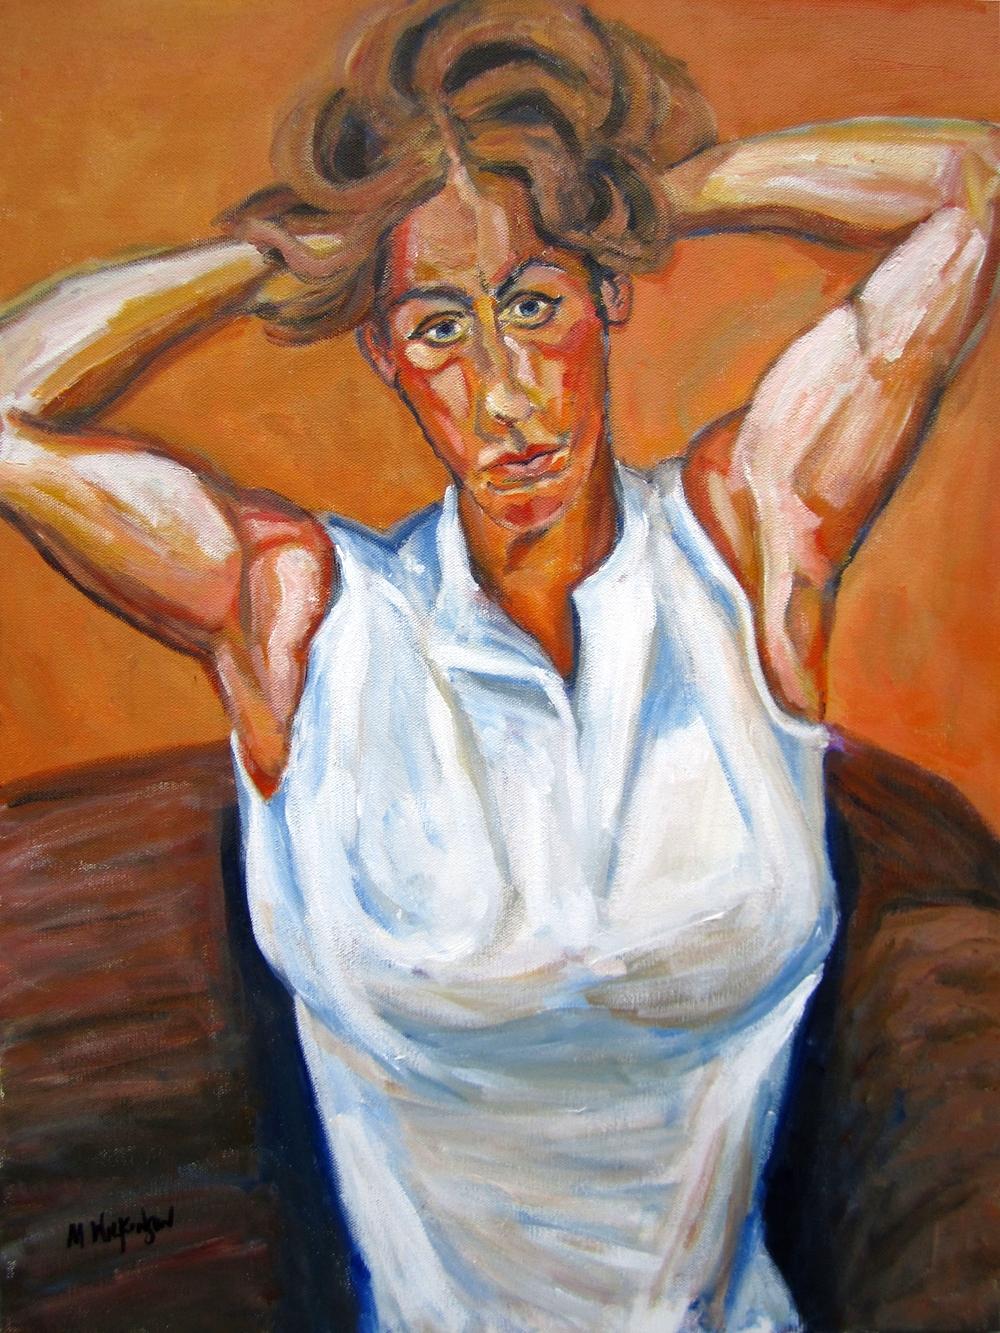 interpretation figure with bare arms